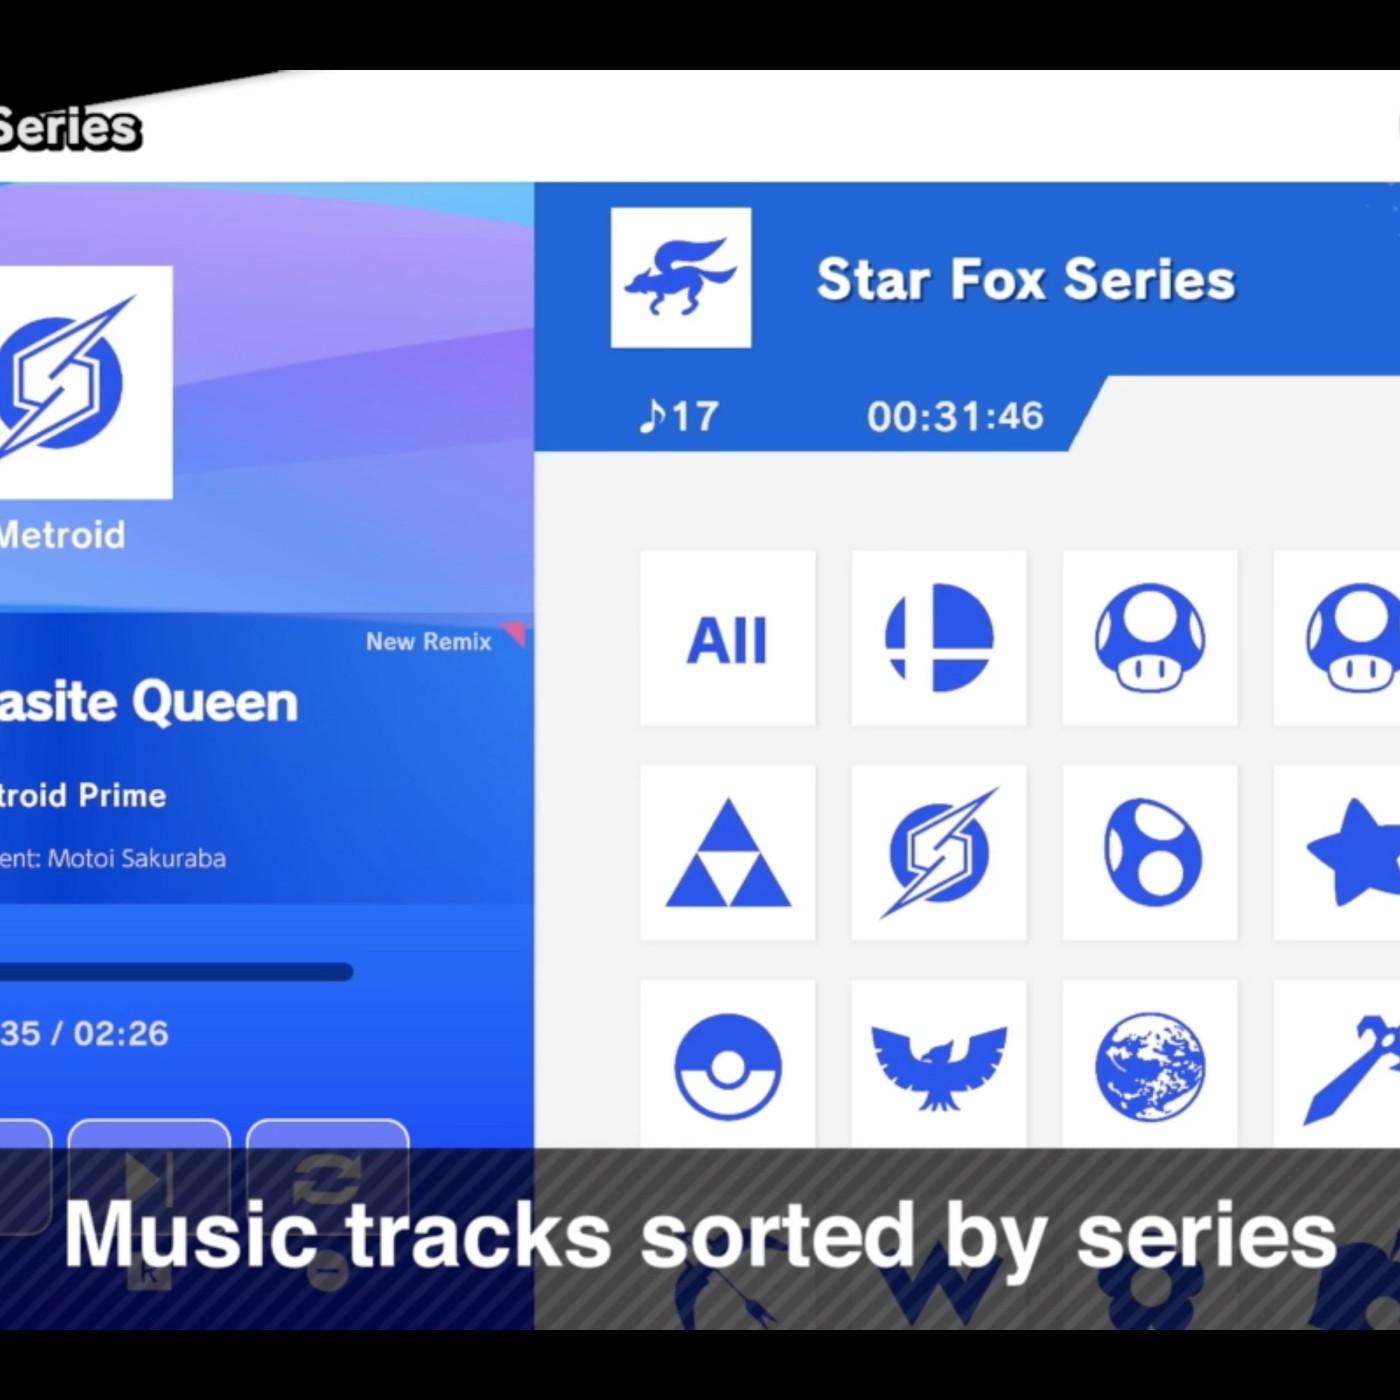 Super Smash Bros  Ultimate lets you listen to the soundtrack